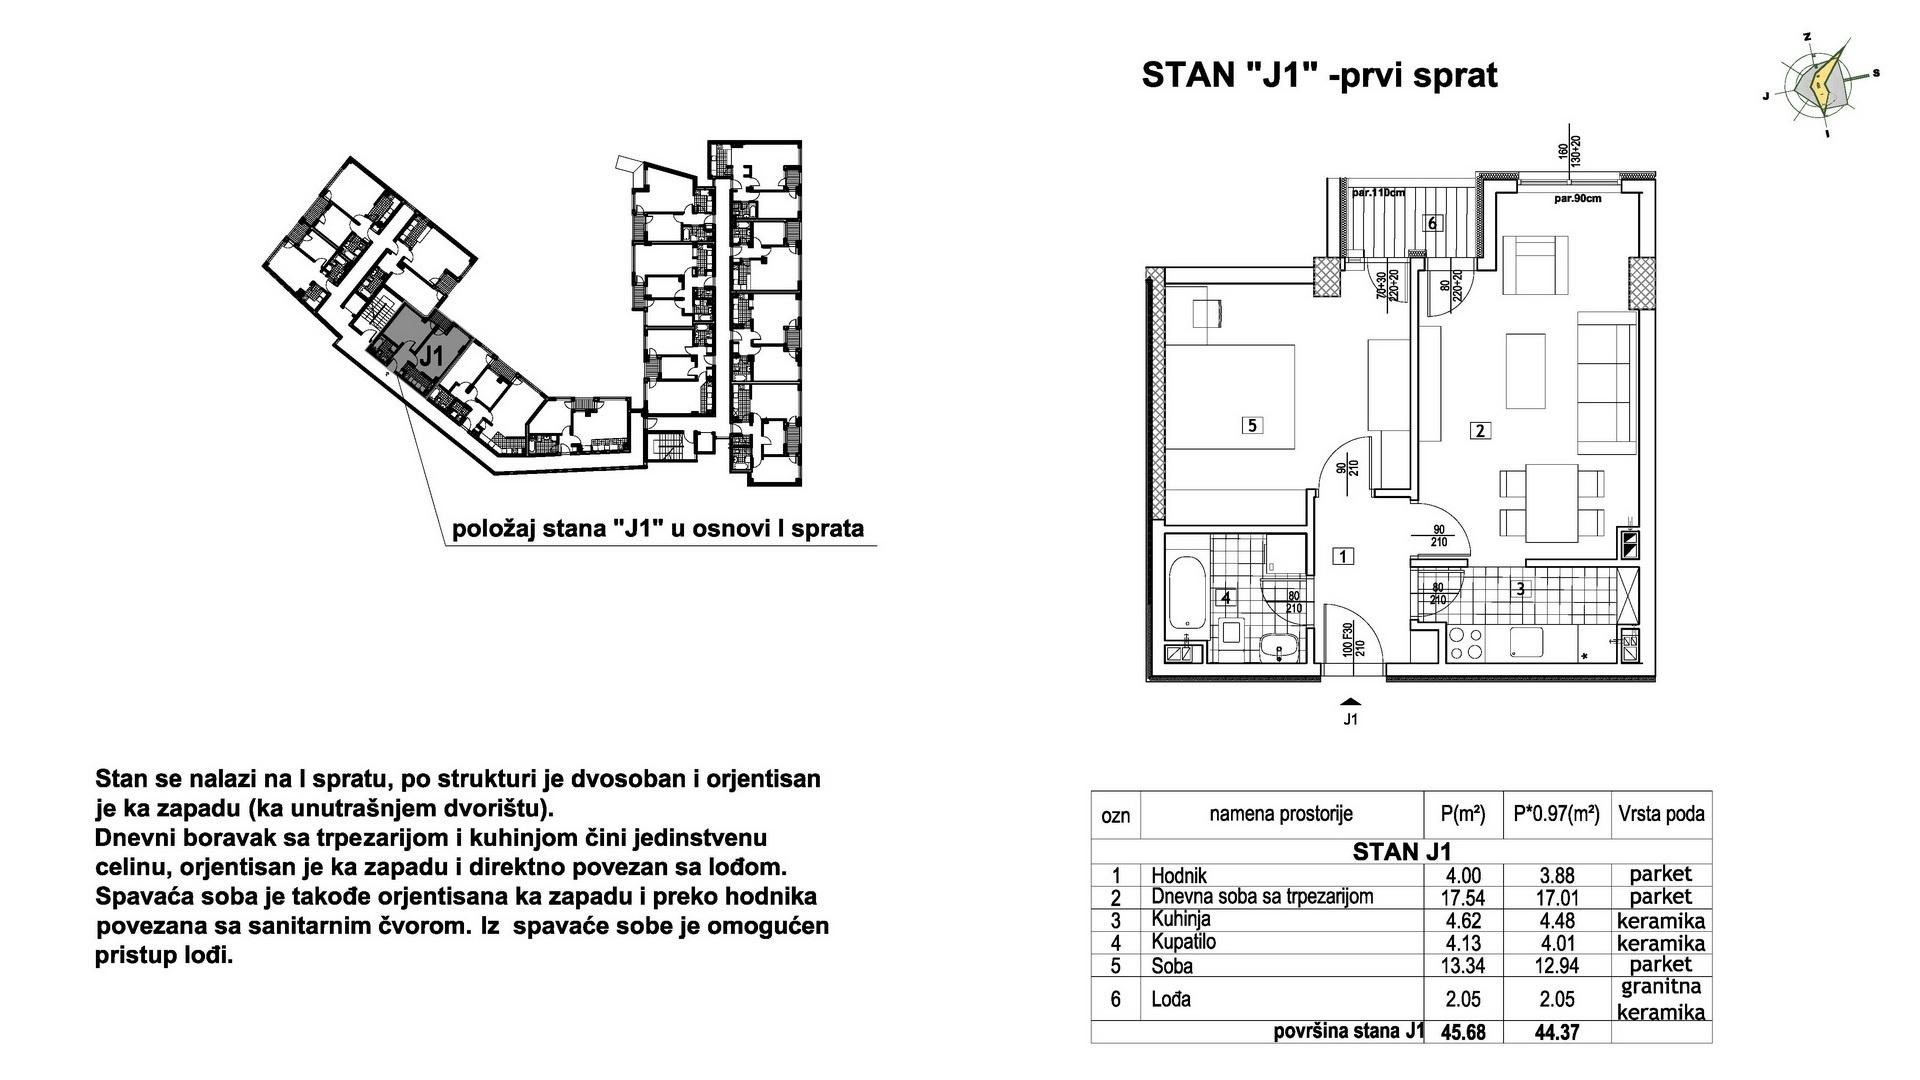 Objekat u Prešernovoj bb - Stan J1